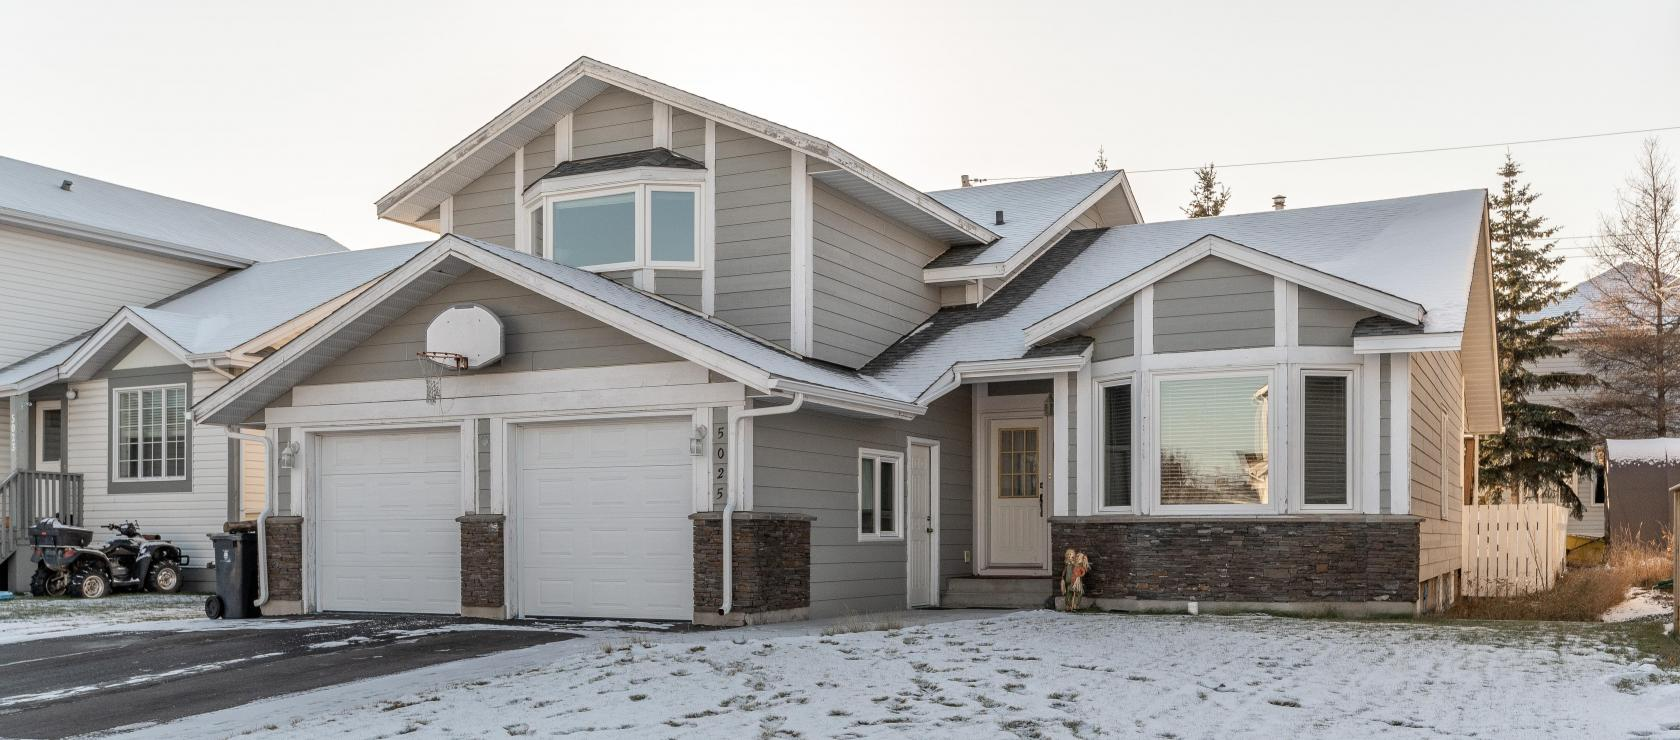 5025 Finlayson Drive, Frame Lake South, Yellowknife 2